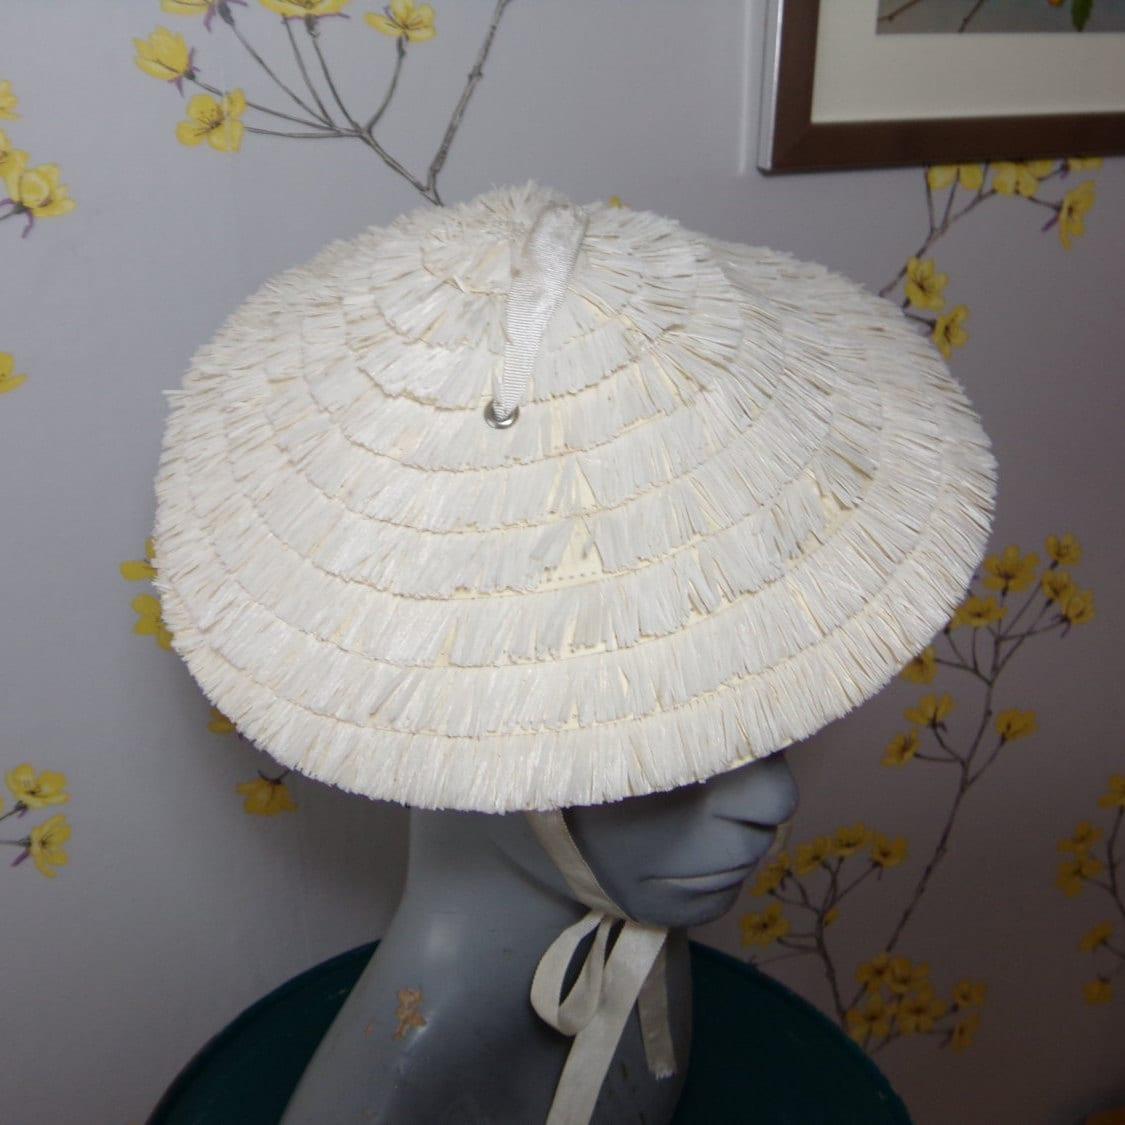 Coolie Hat: Vintage Cone Hat 1950s Child Size Hat Coolie Hat Asian Style